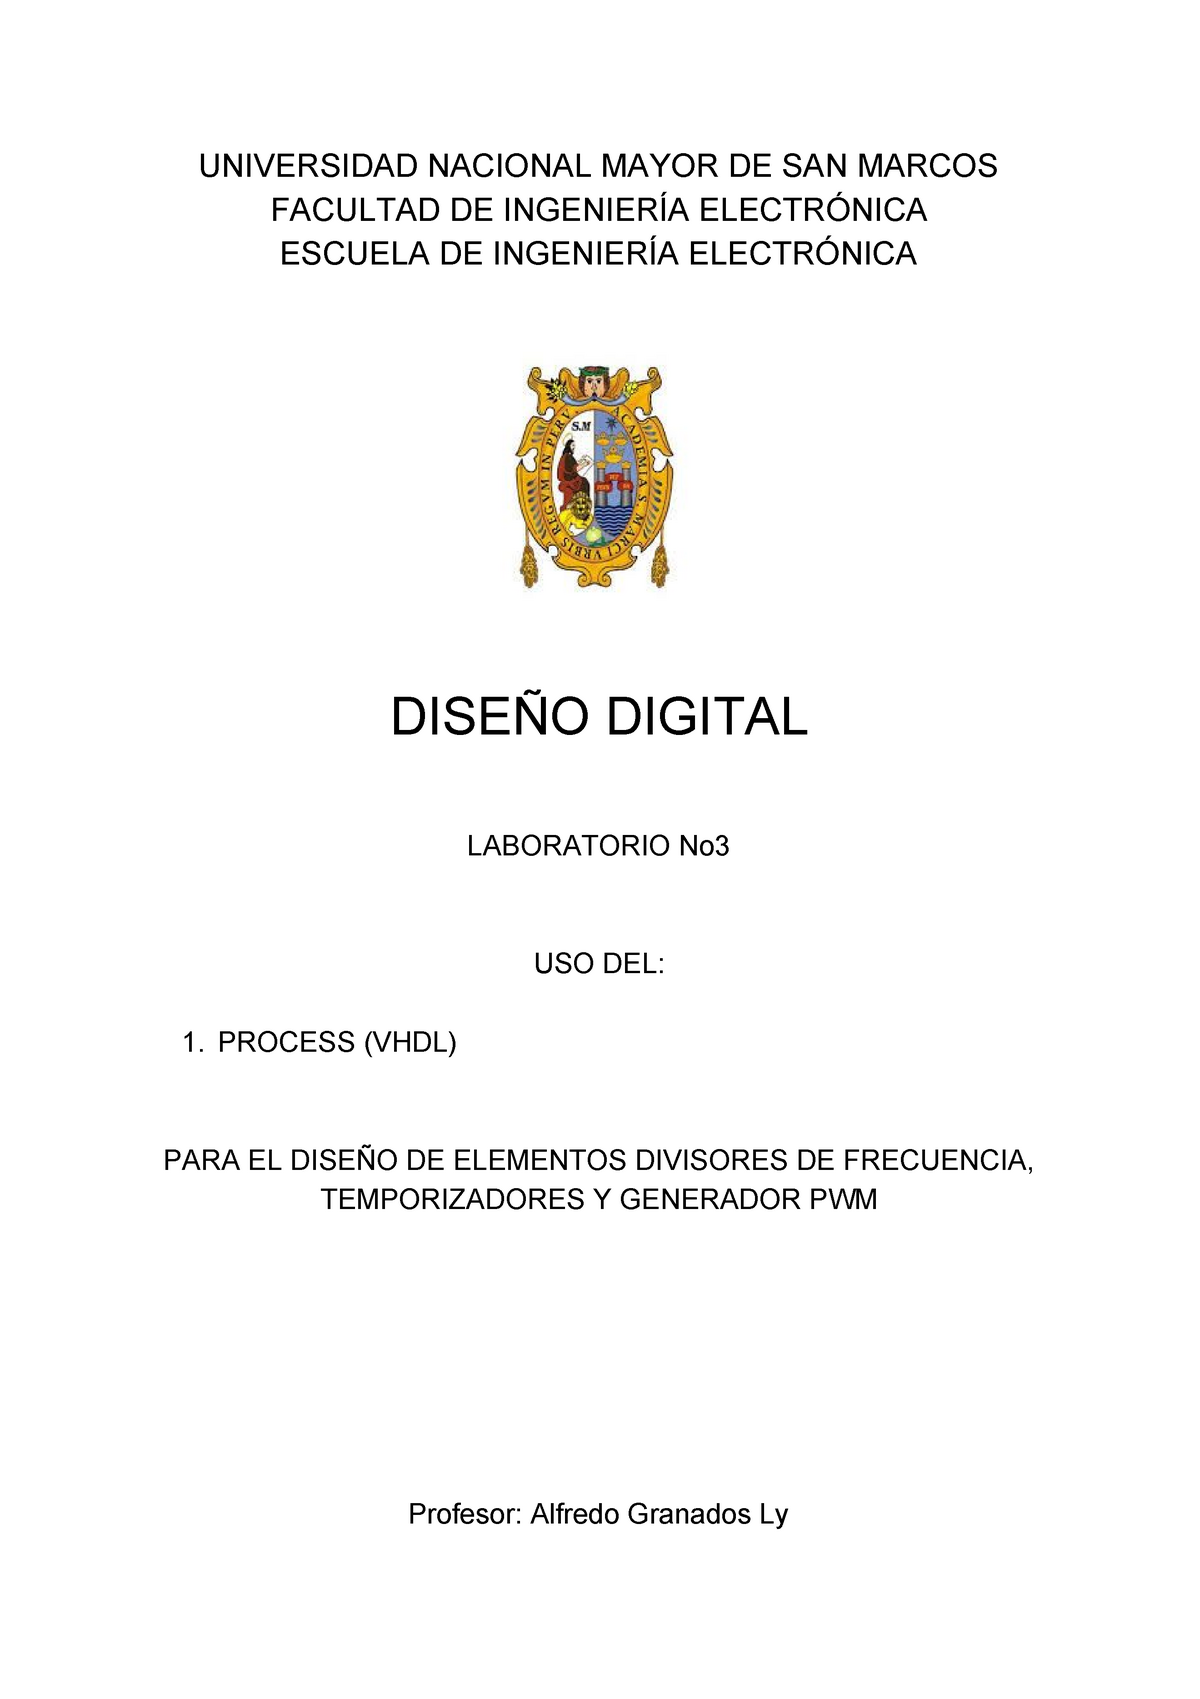 Divisores Temporisadores PWM - 190085: Diseño digital - StuDocu